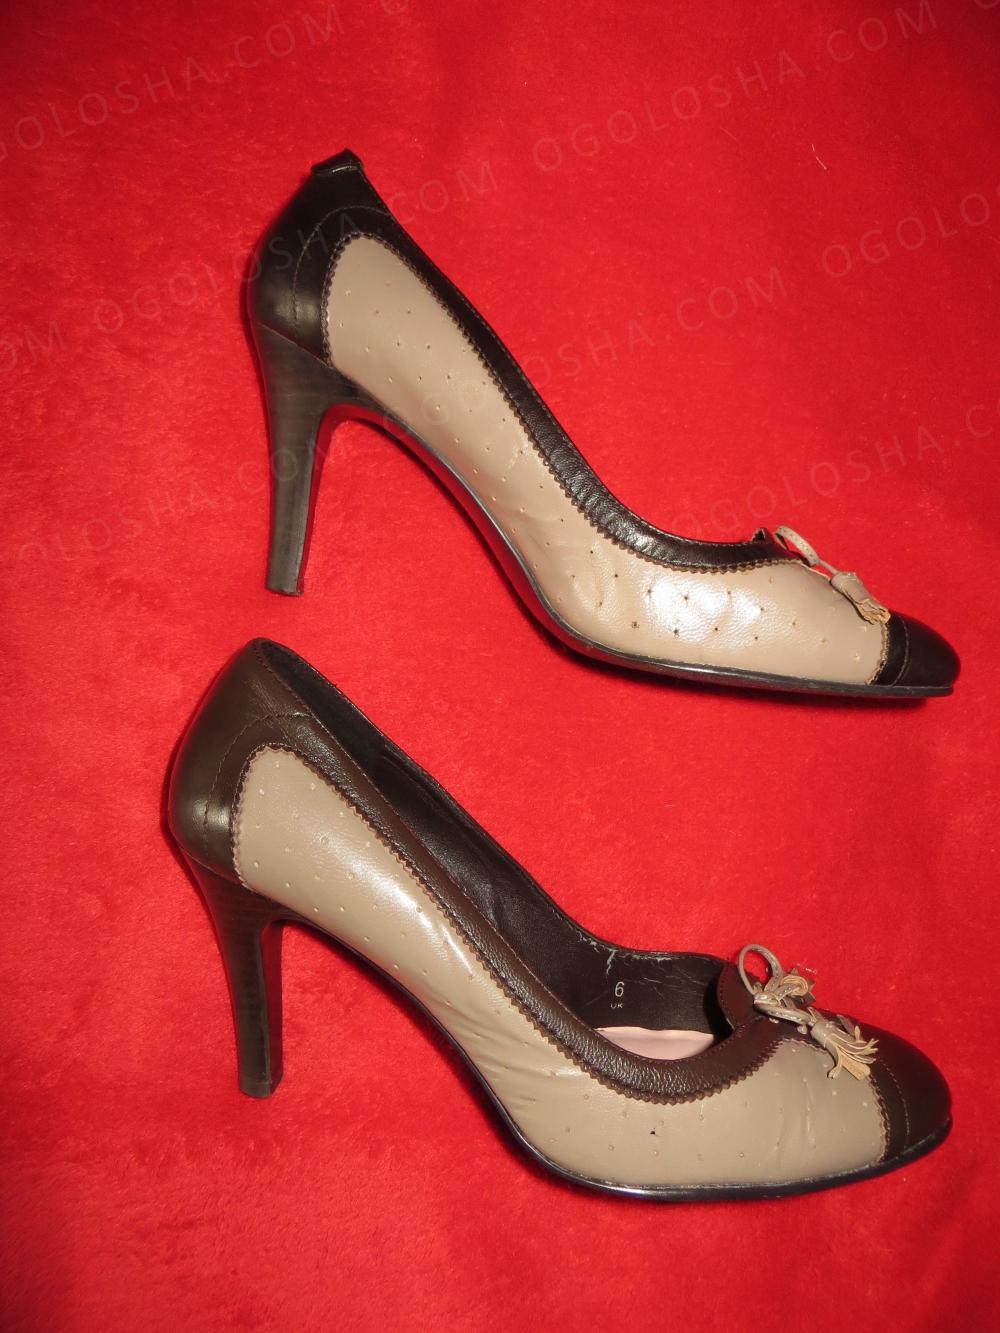 Туфли кожа MARKS&SPENSER 39,5, каблук 9см. Отл сост.